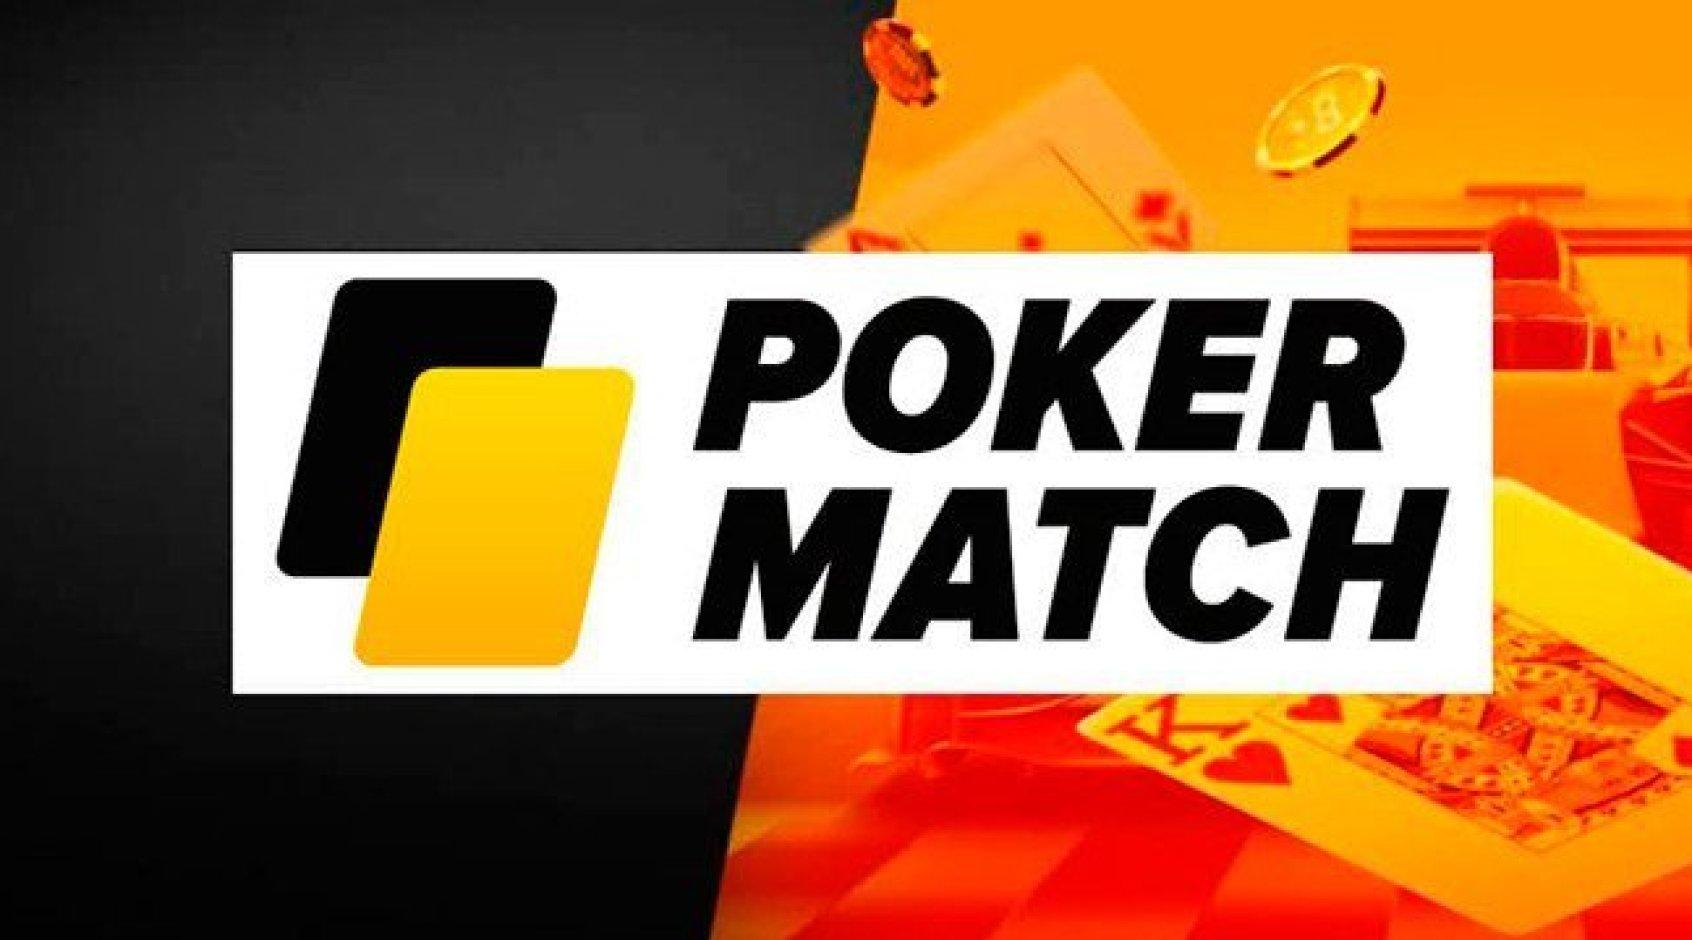 Heroes of Windfall: PokerMatch ежедневно разыгрывает 20 тысяч гривен